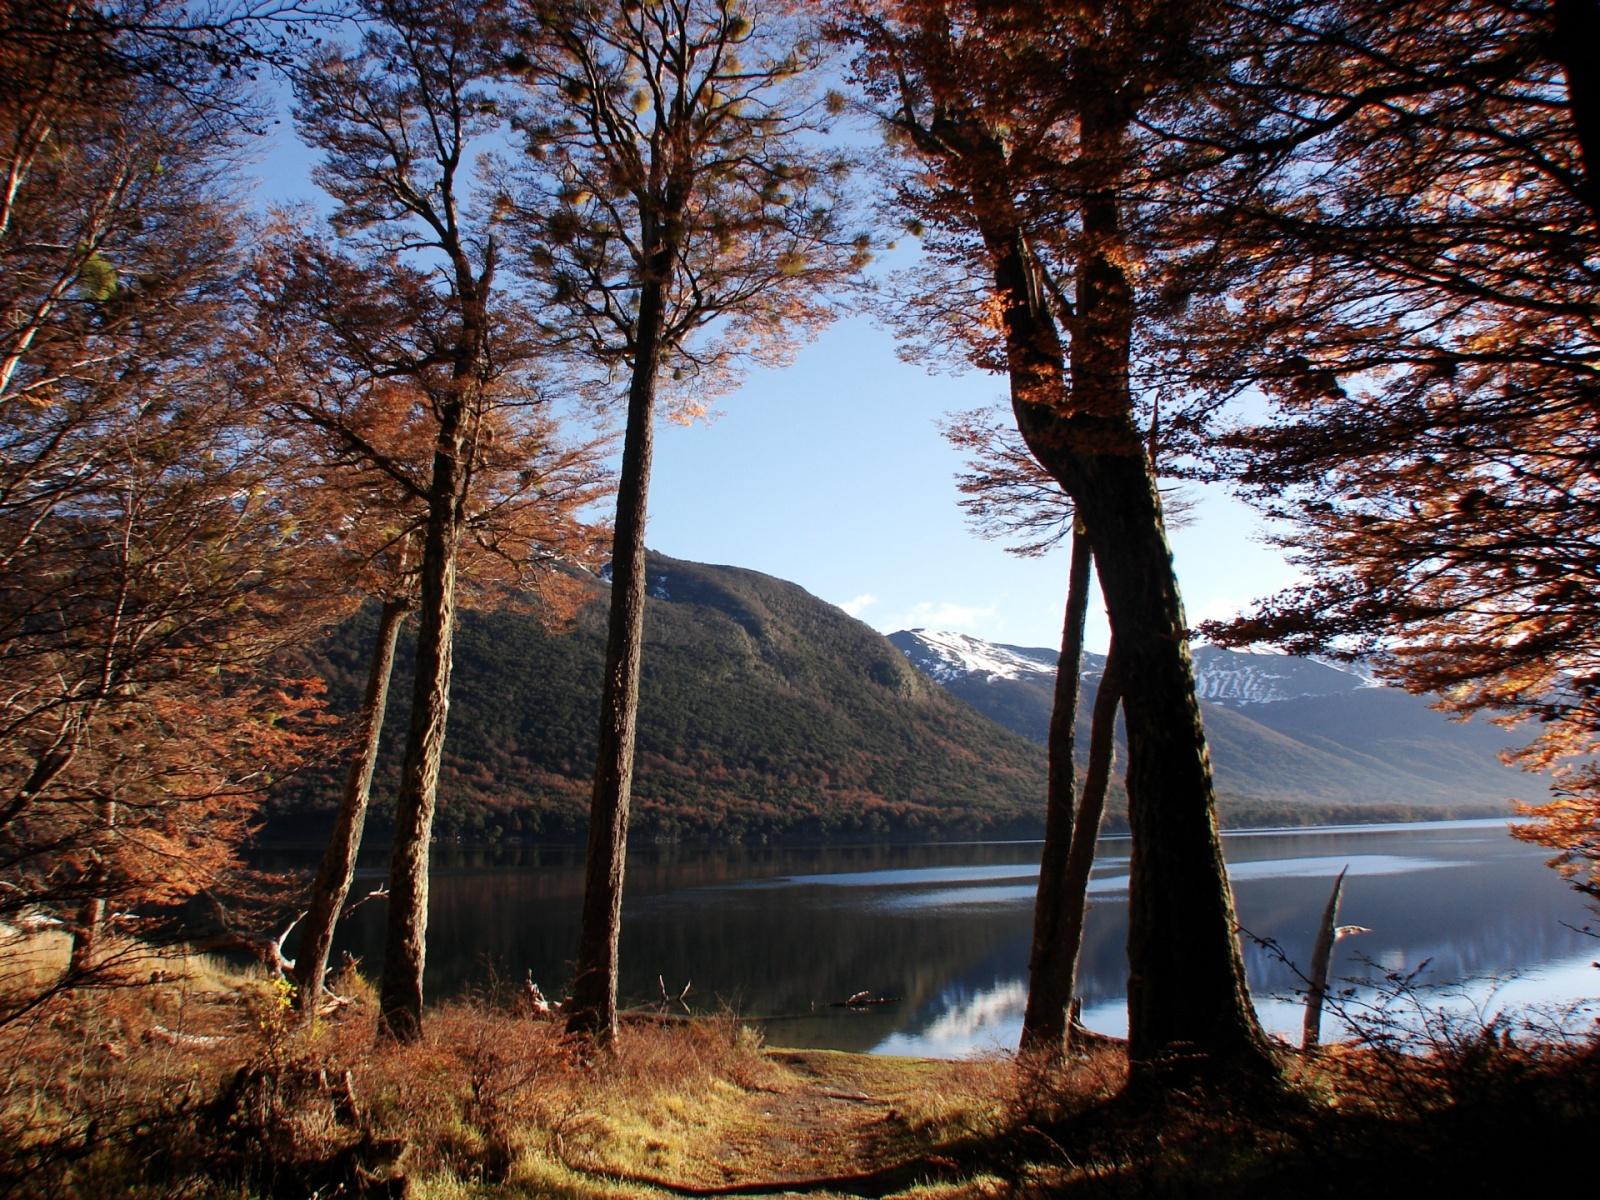 The best top autumn desktop wallpapers 4 En Güzel Sonbahar HD Duvar Kağıtları